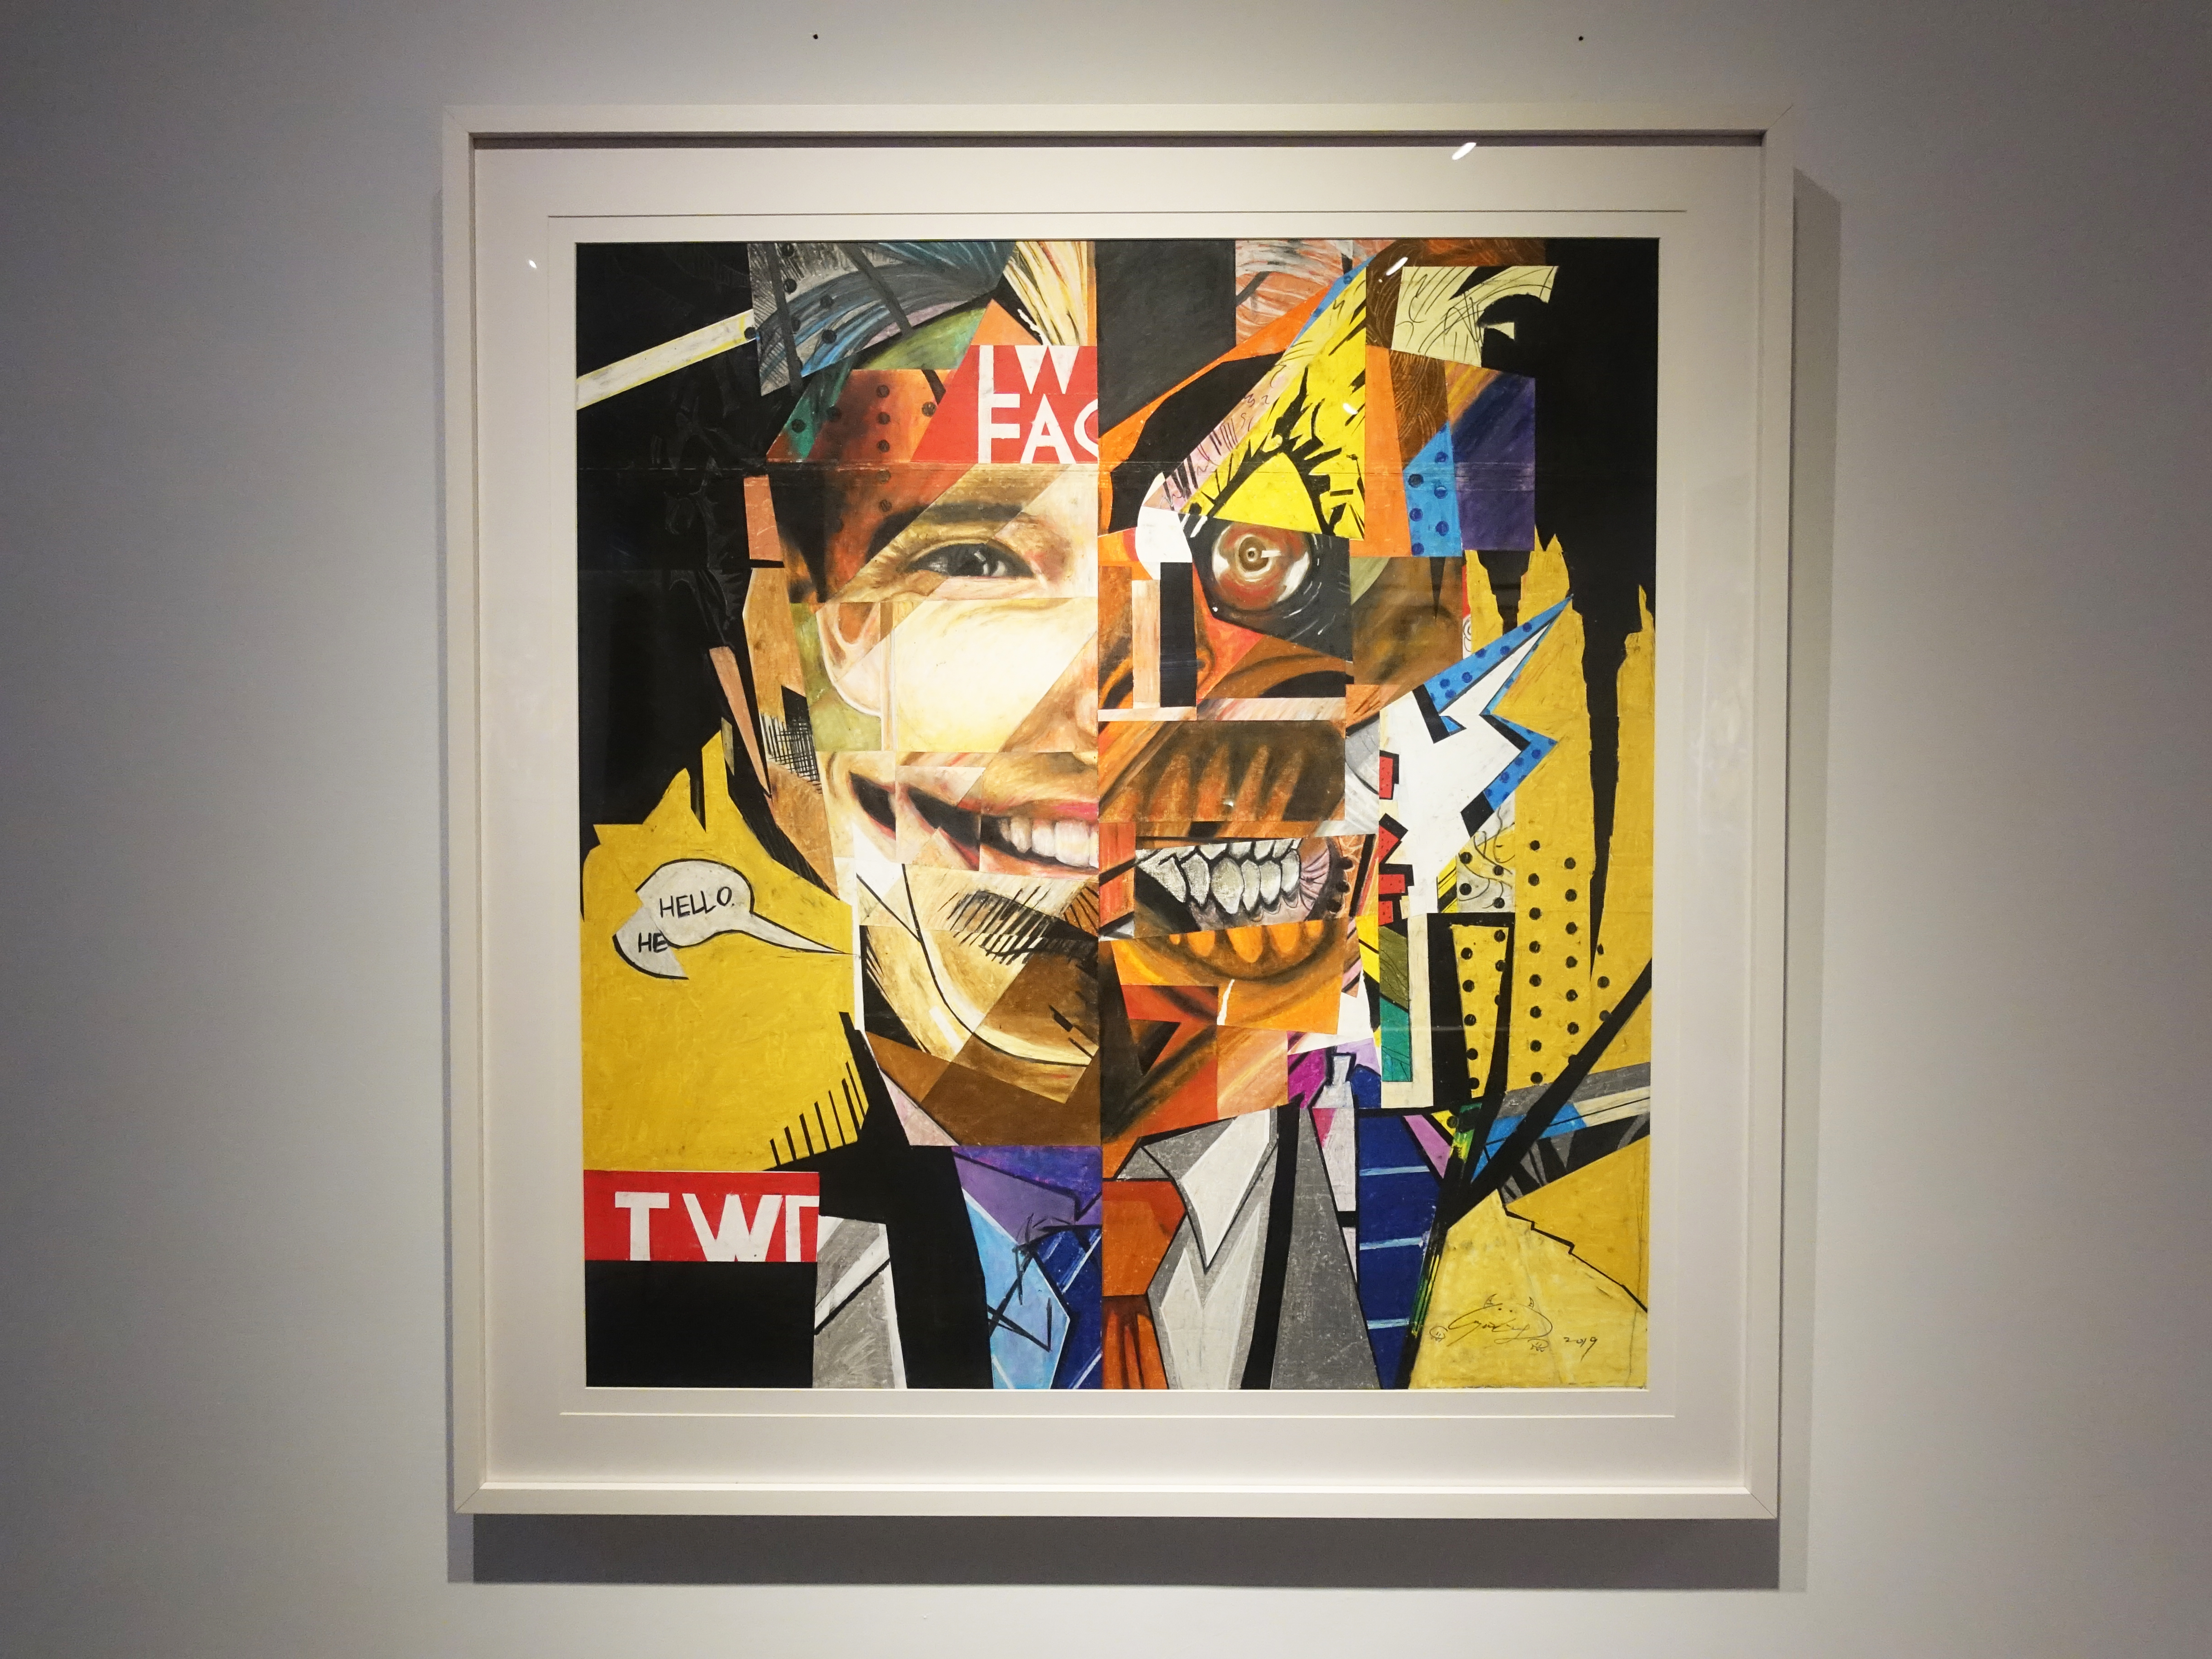 林俊良,《Under the impression of Two Facer》,83 x 83 cm,油畫棒繪於紙上。